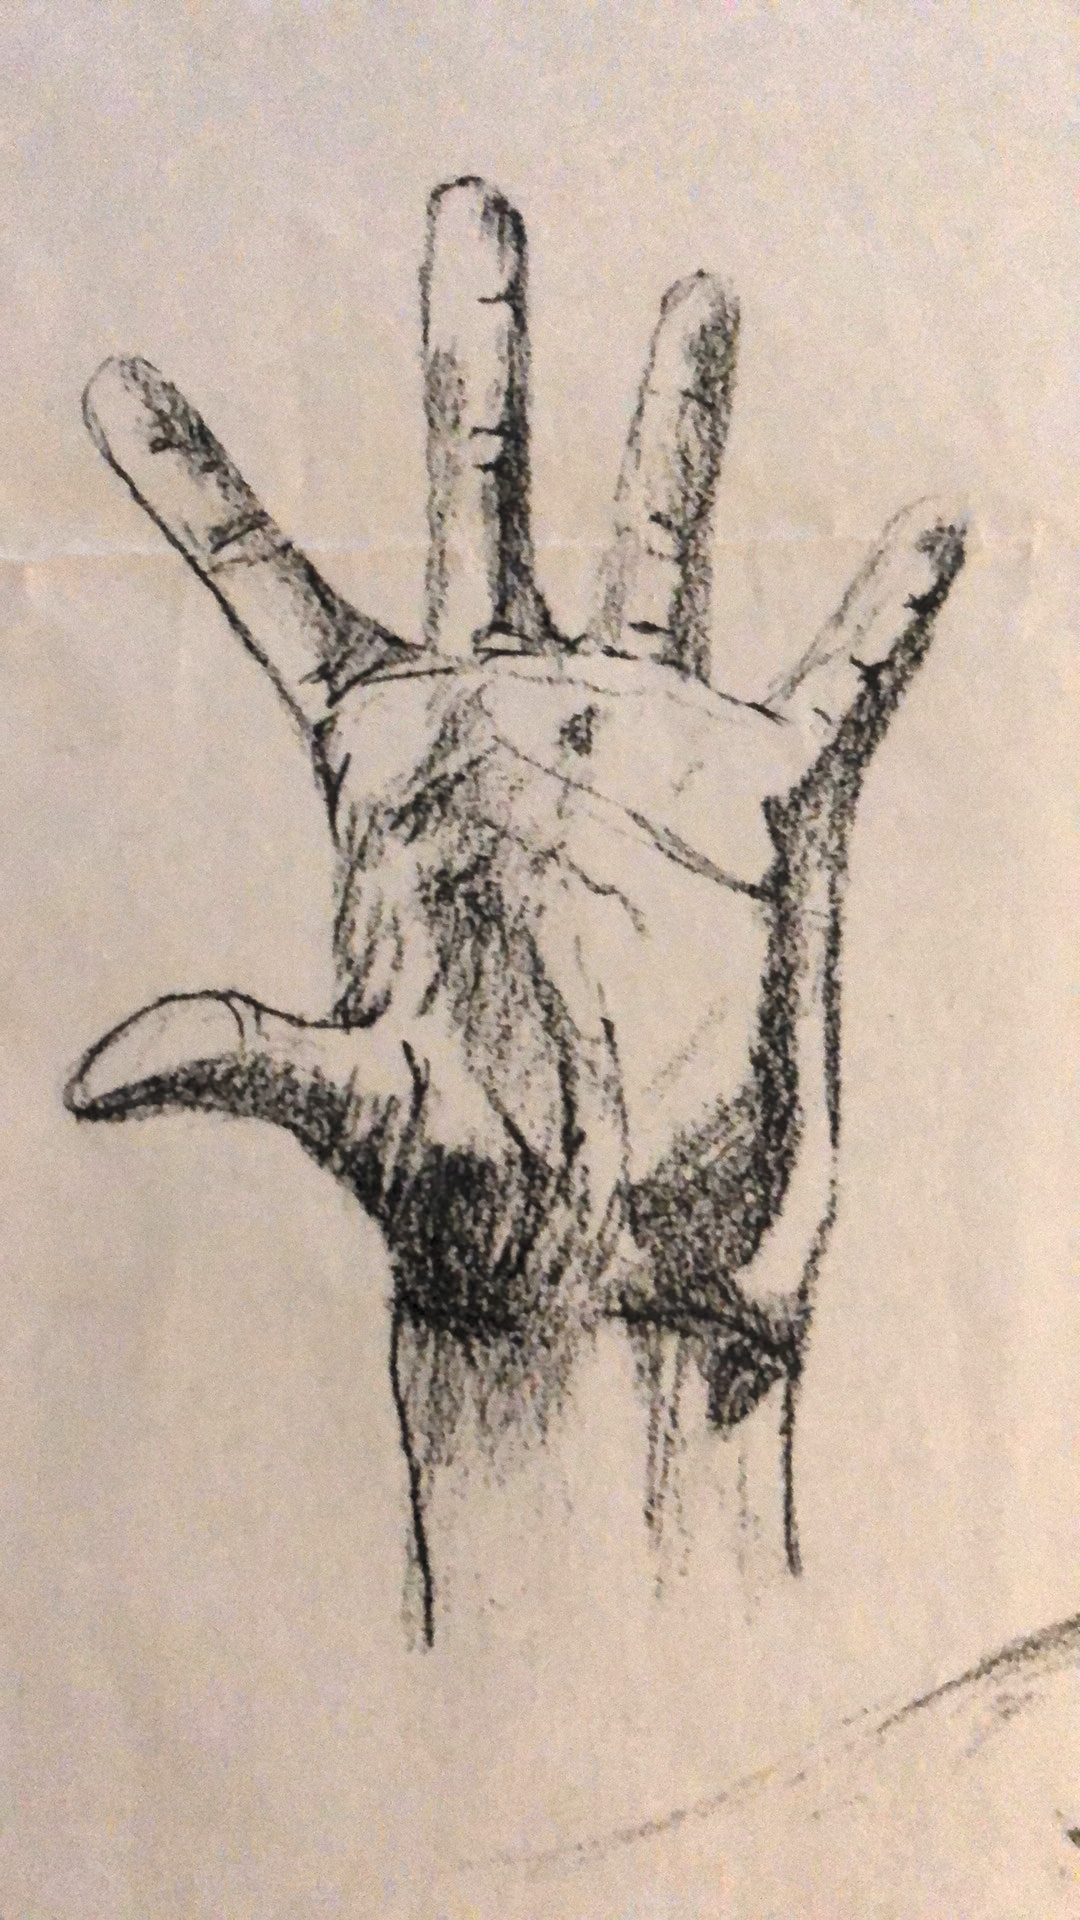 42_hand-sketch-97